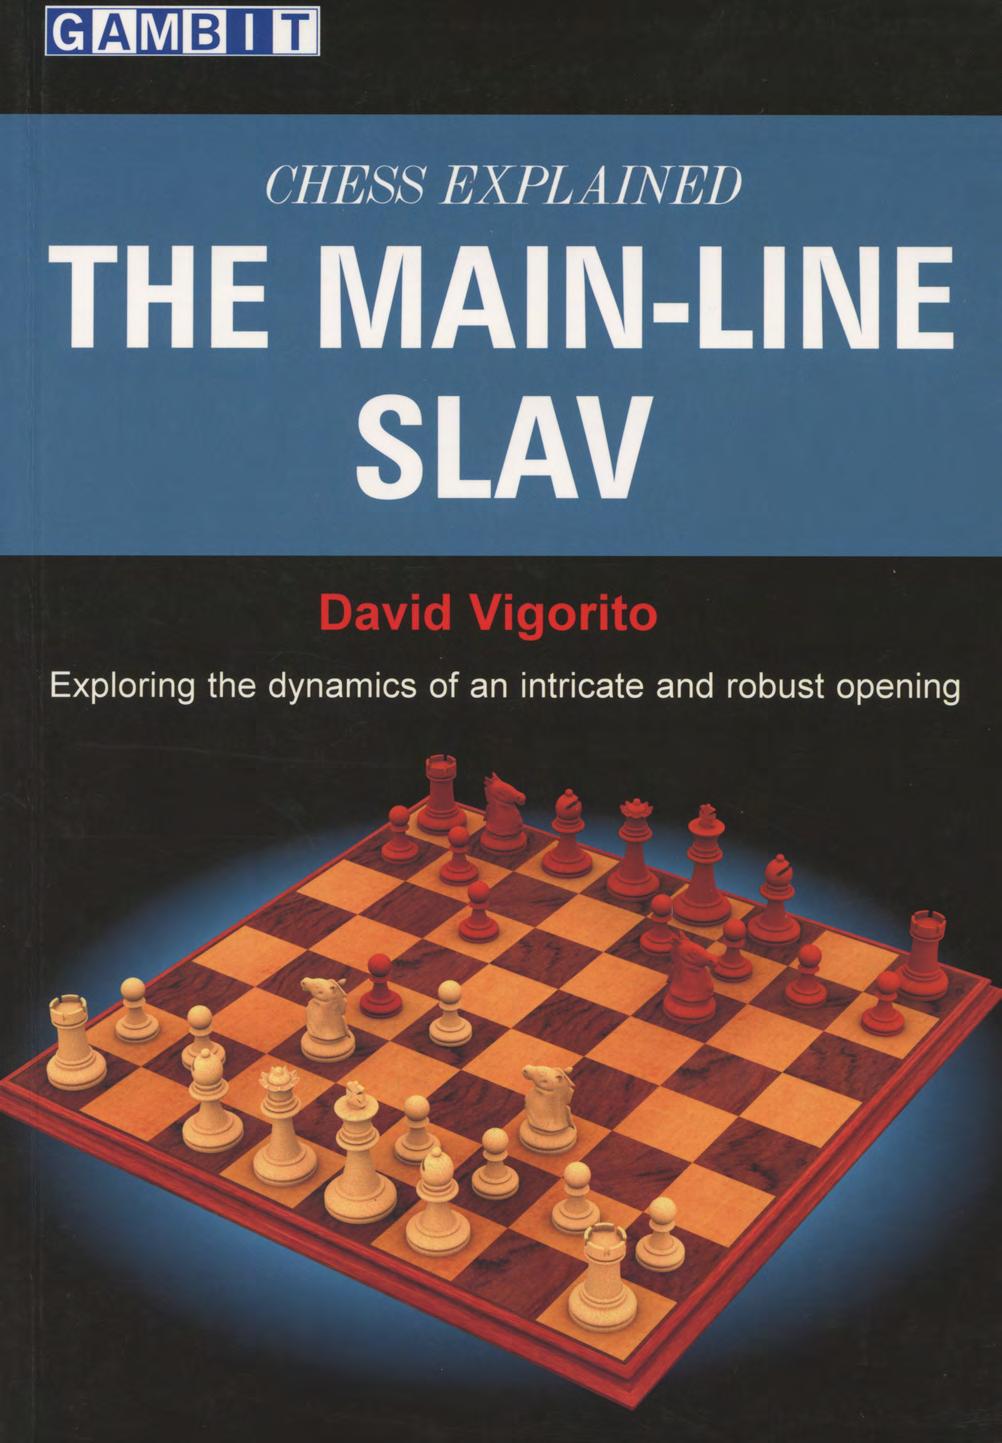 The Main Line Slav